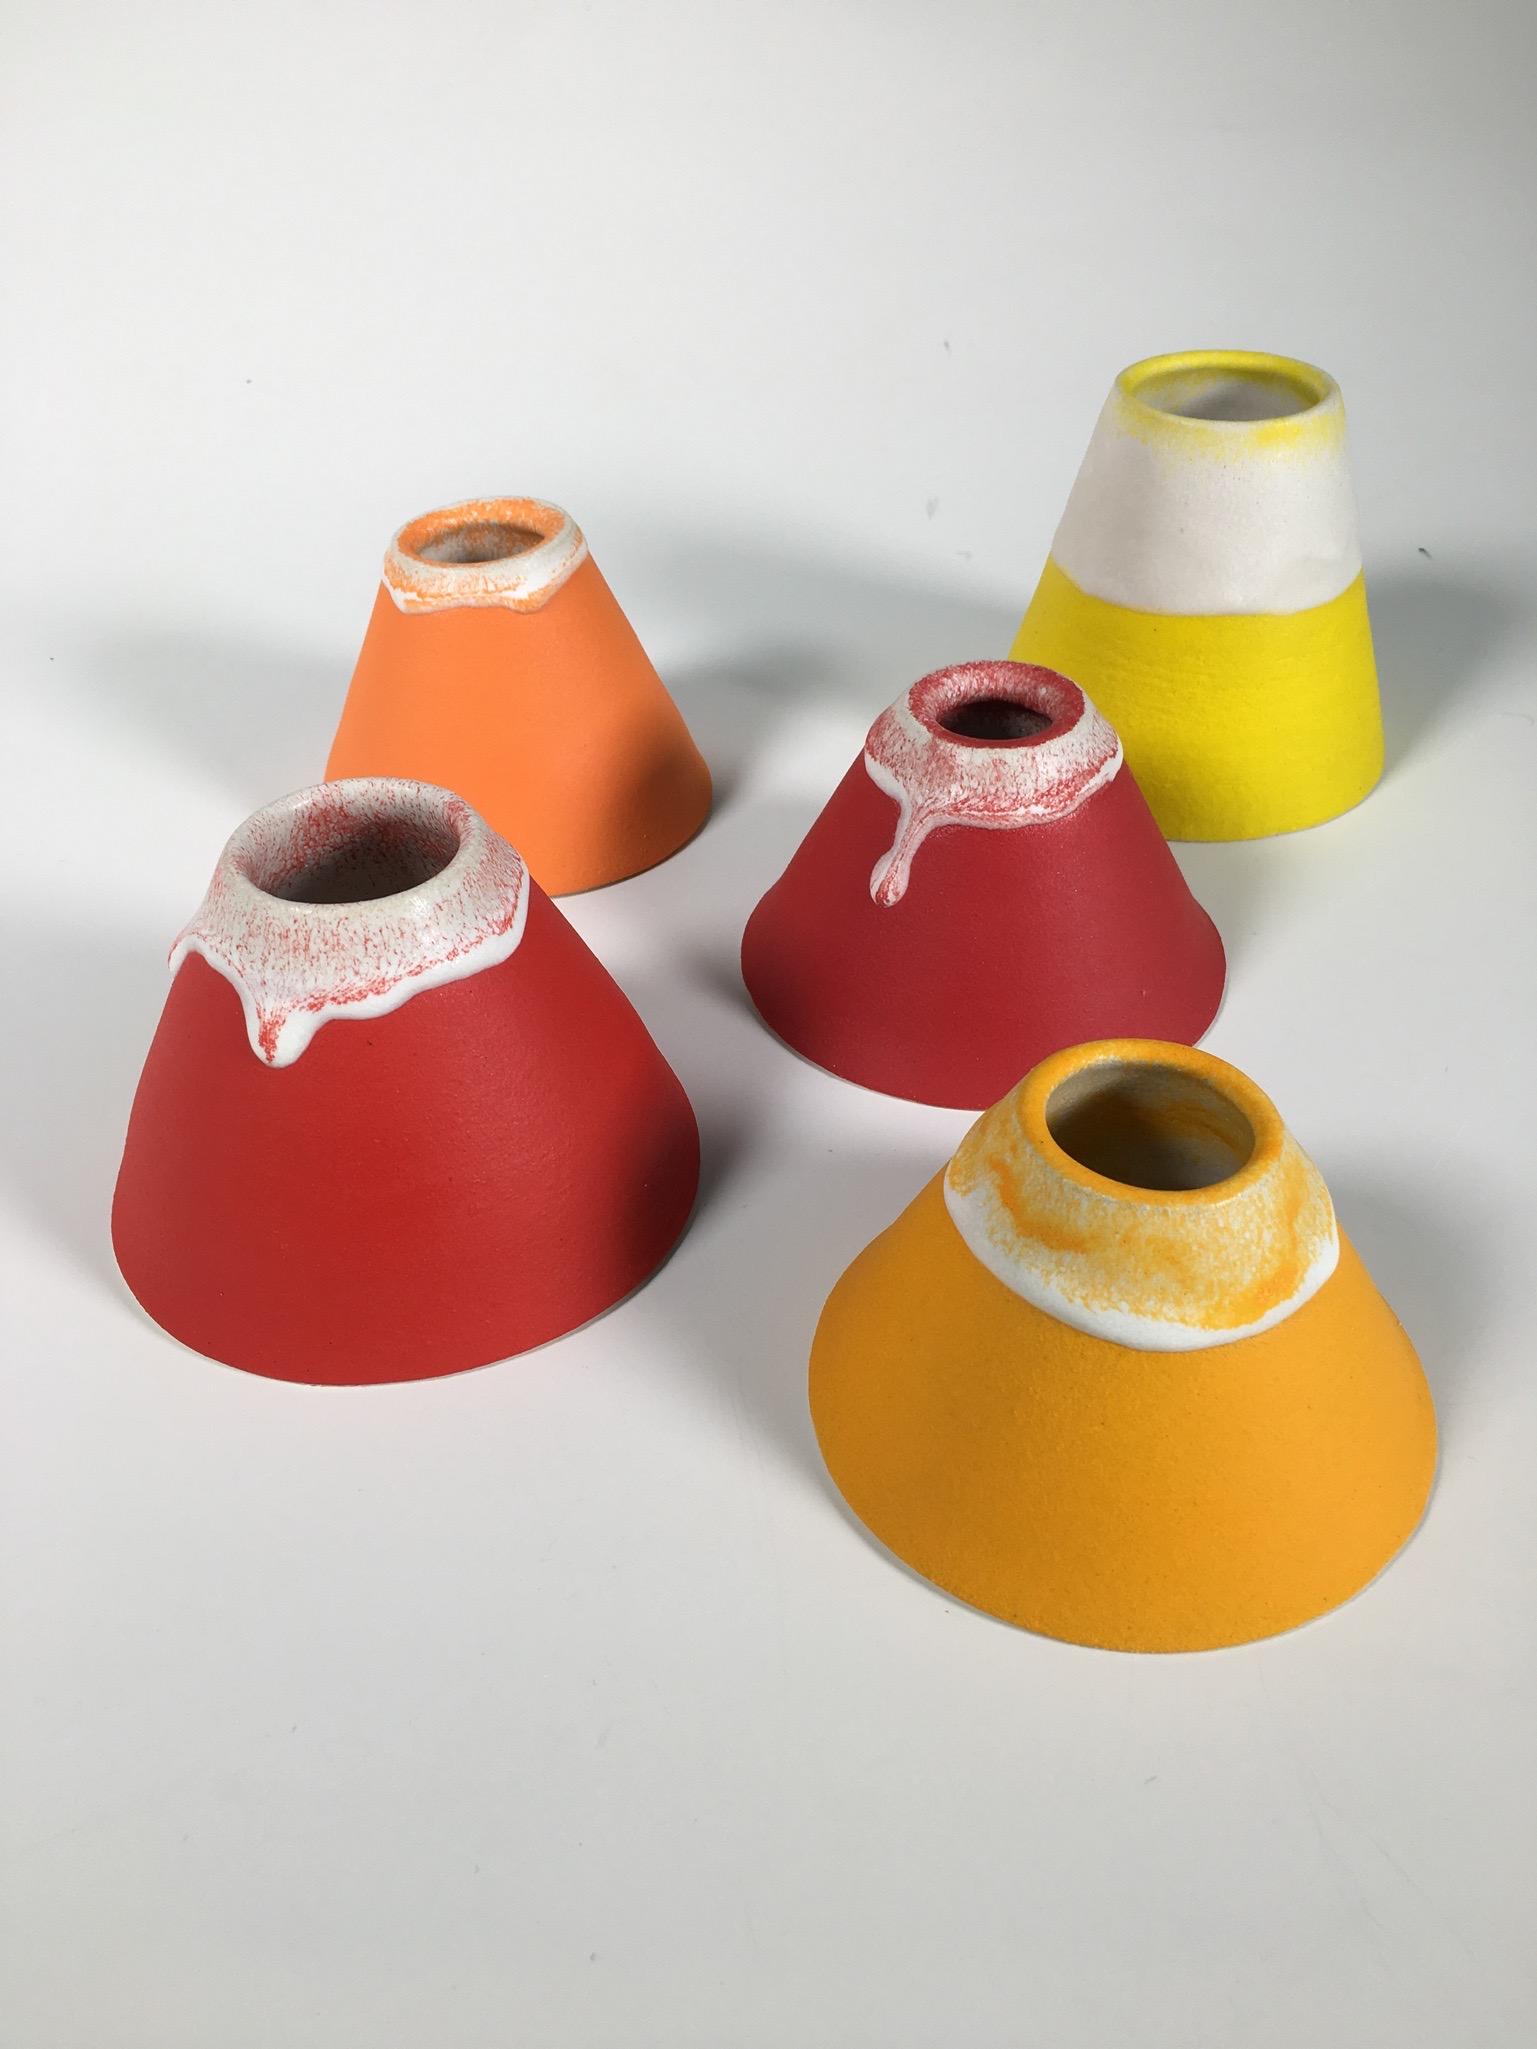 Ceramic work by Bean Finneran